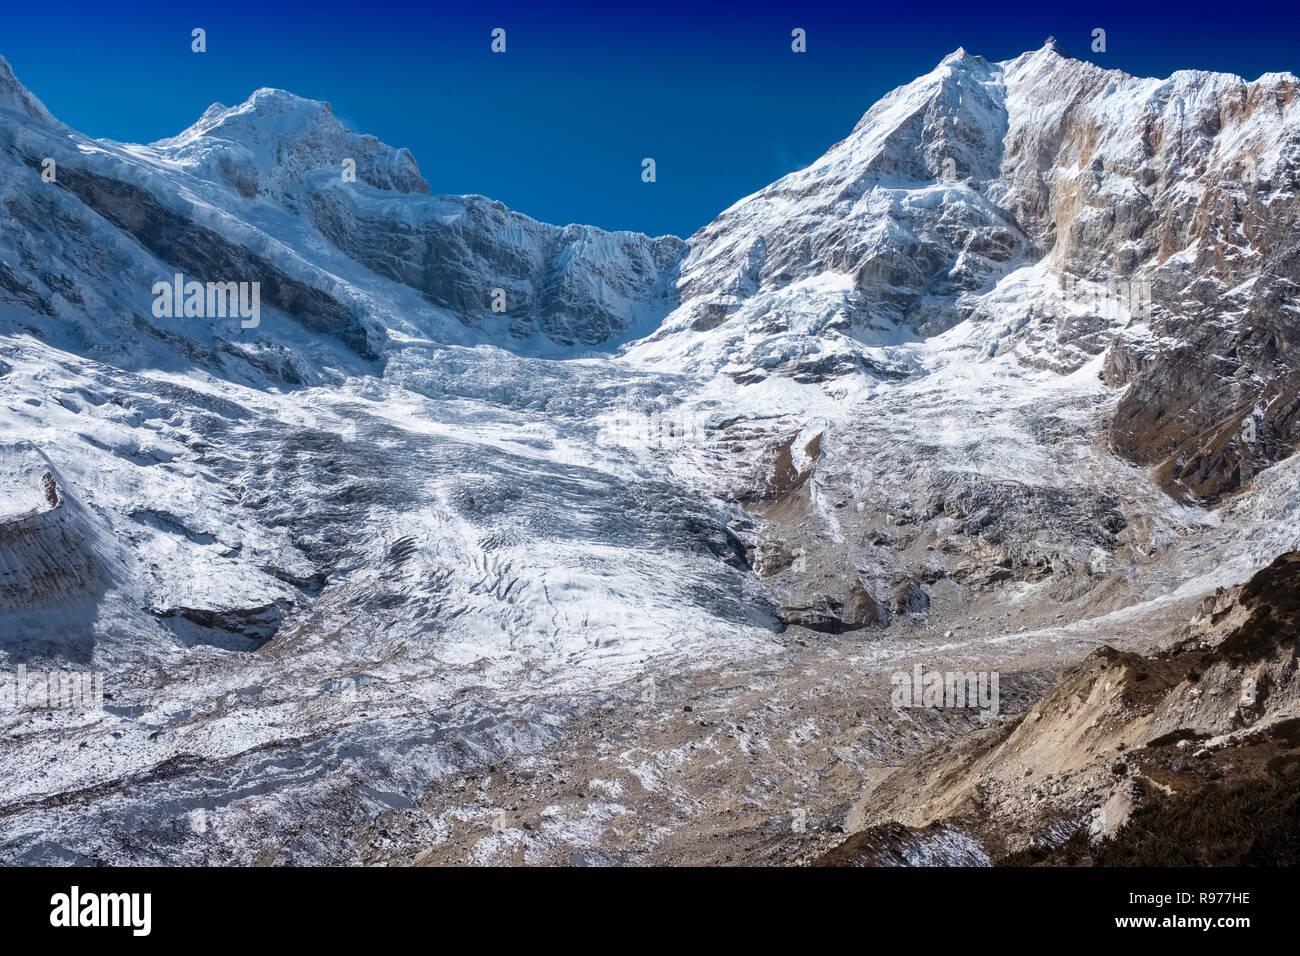 Manaslu peak and glacier in the Nepal Himalaya - Stock Image